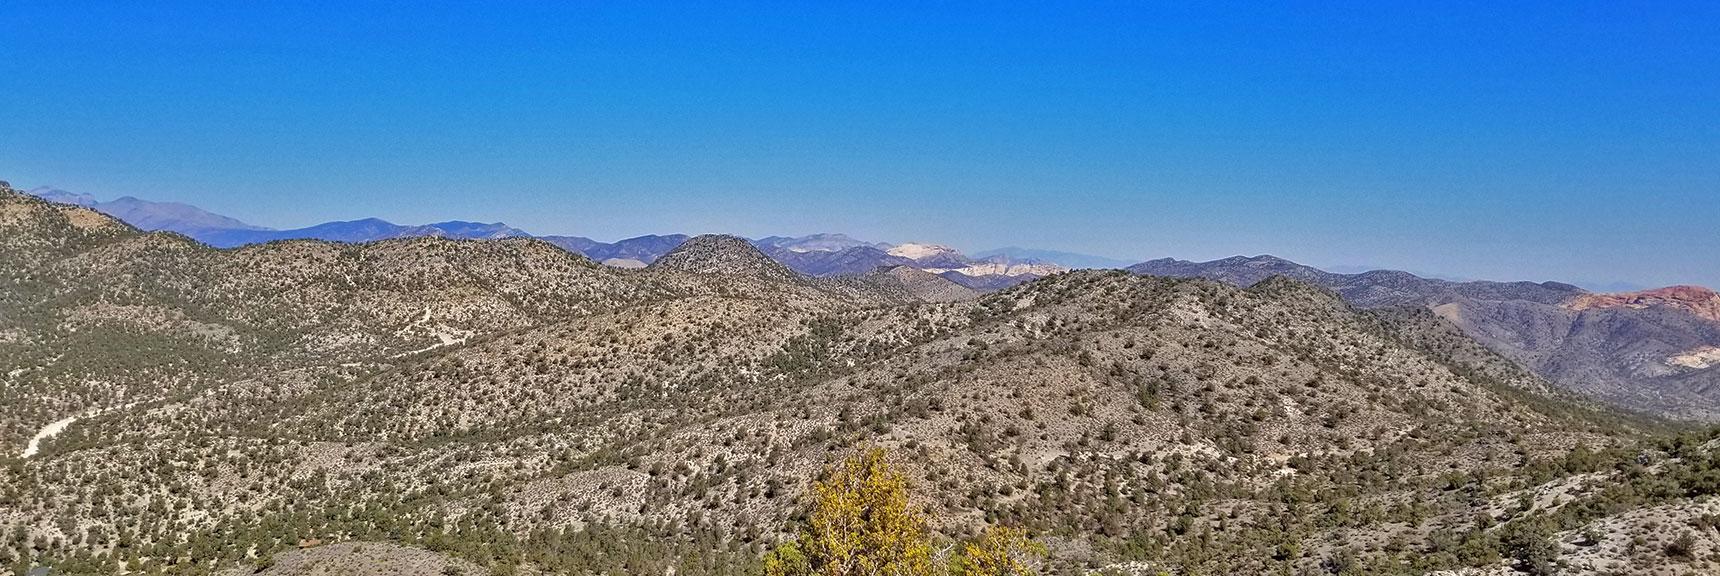 View from Summit Approach Ridge to Rainbow Mountains Wilderness Area   Potosi Mountain Northwestern Approach, Spring Mountains, Nevada